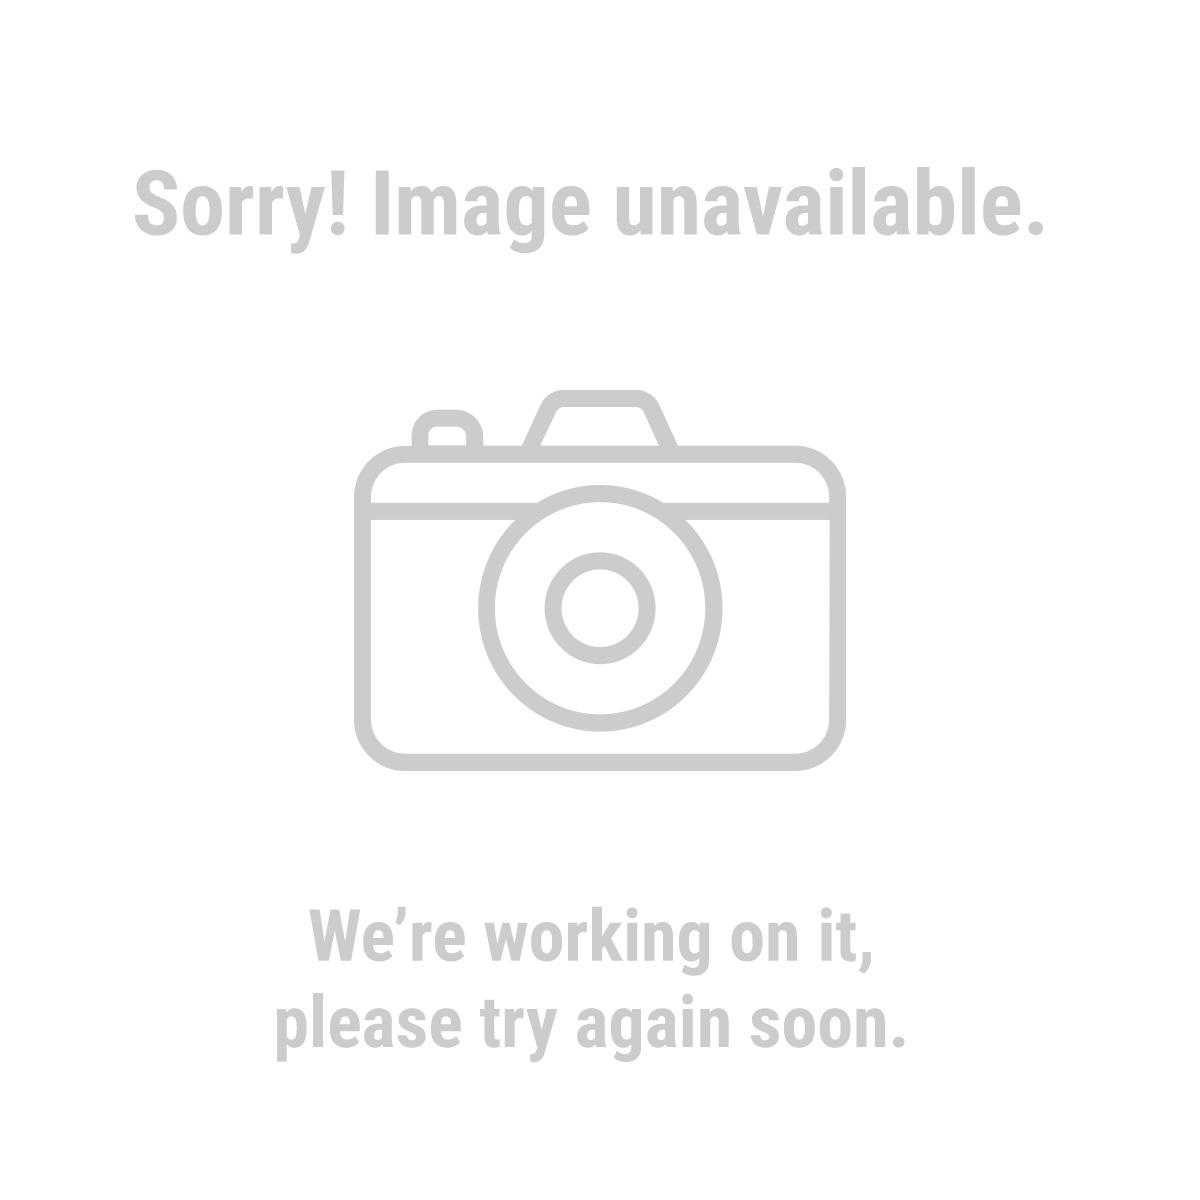 HFT 66832 30 Ft. Retractable Cord Reel